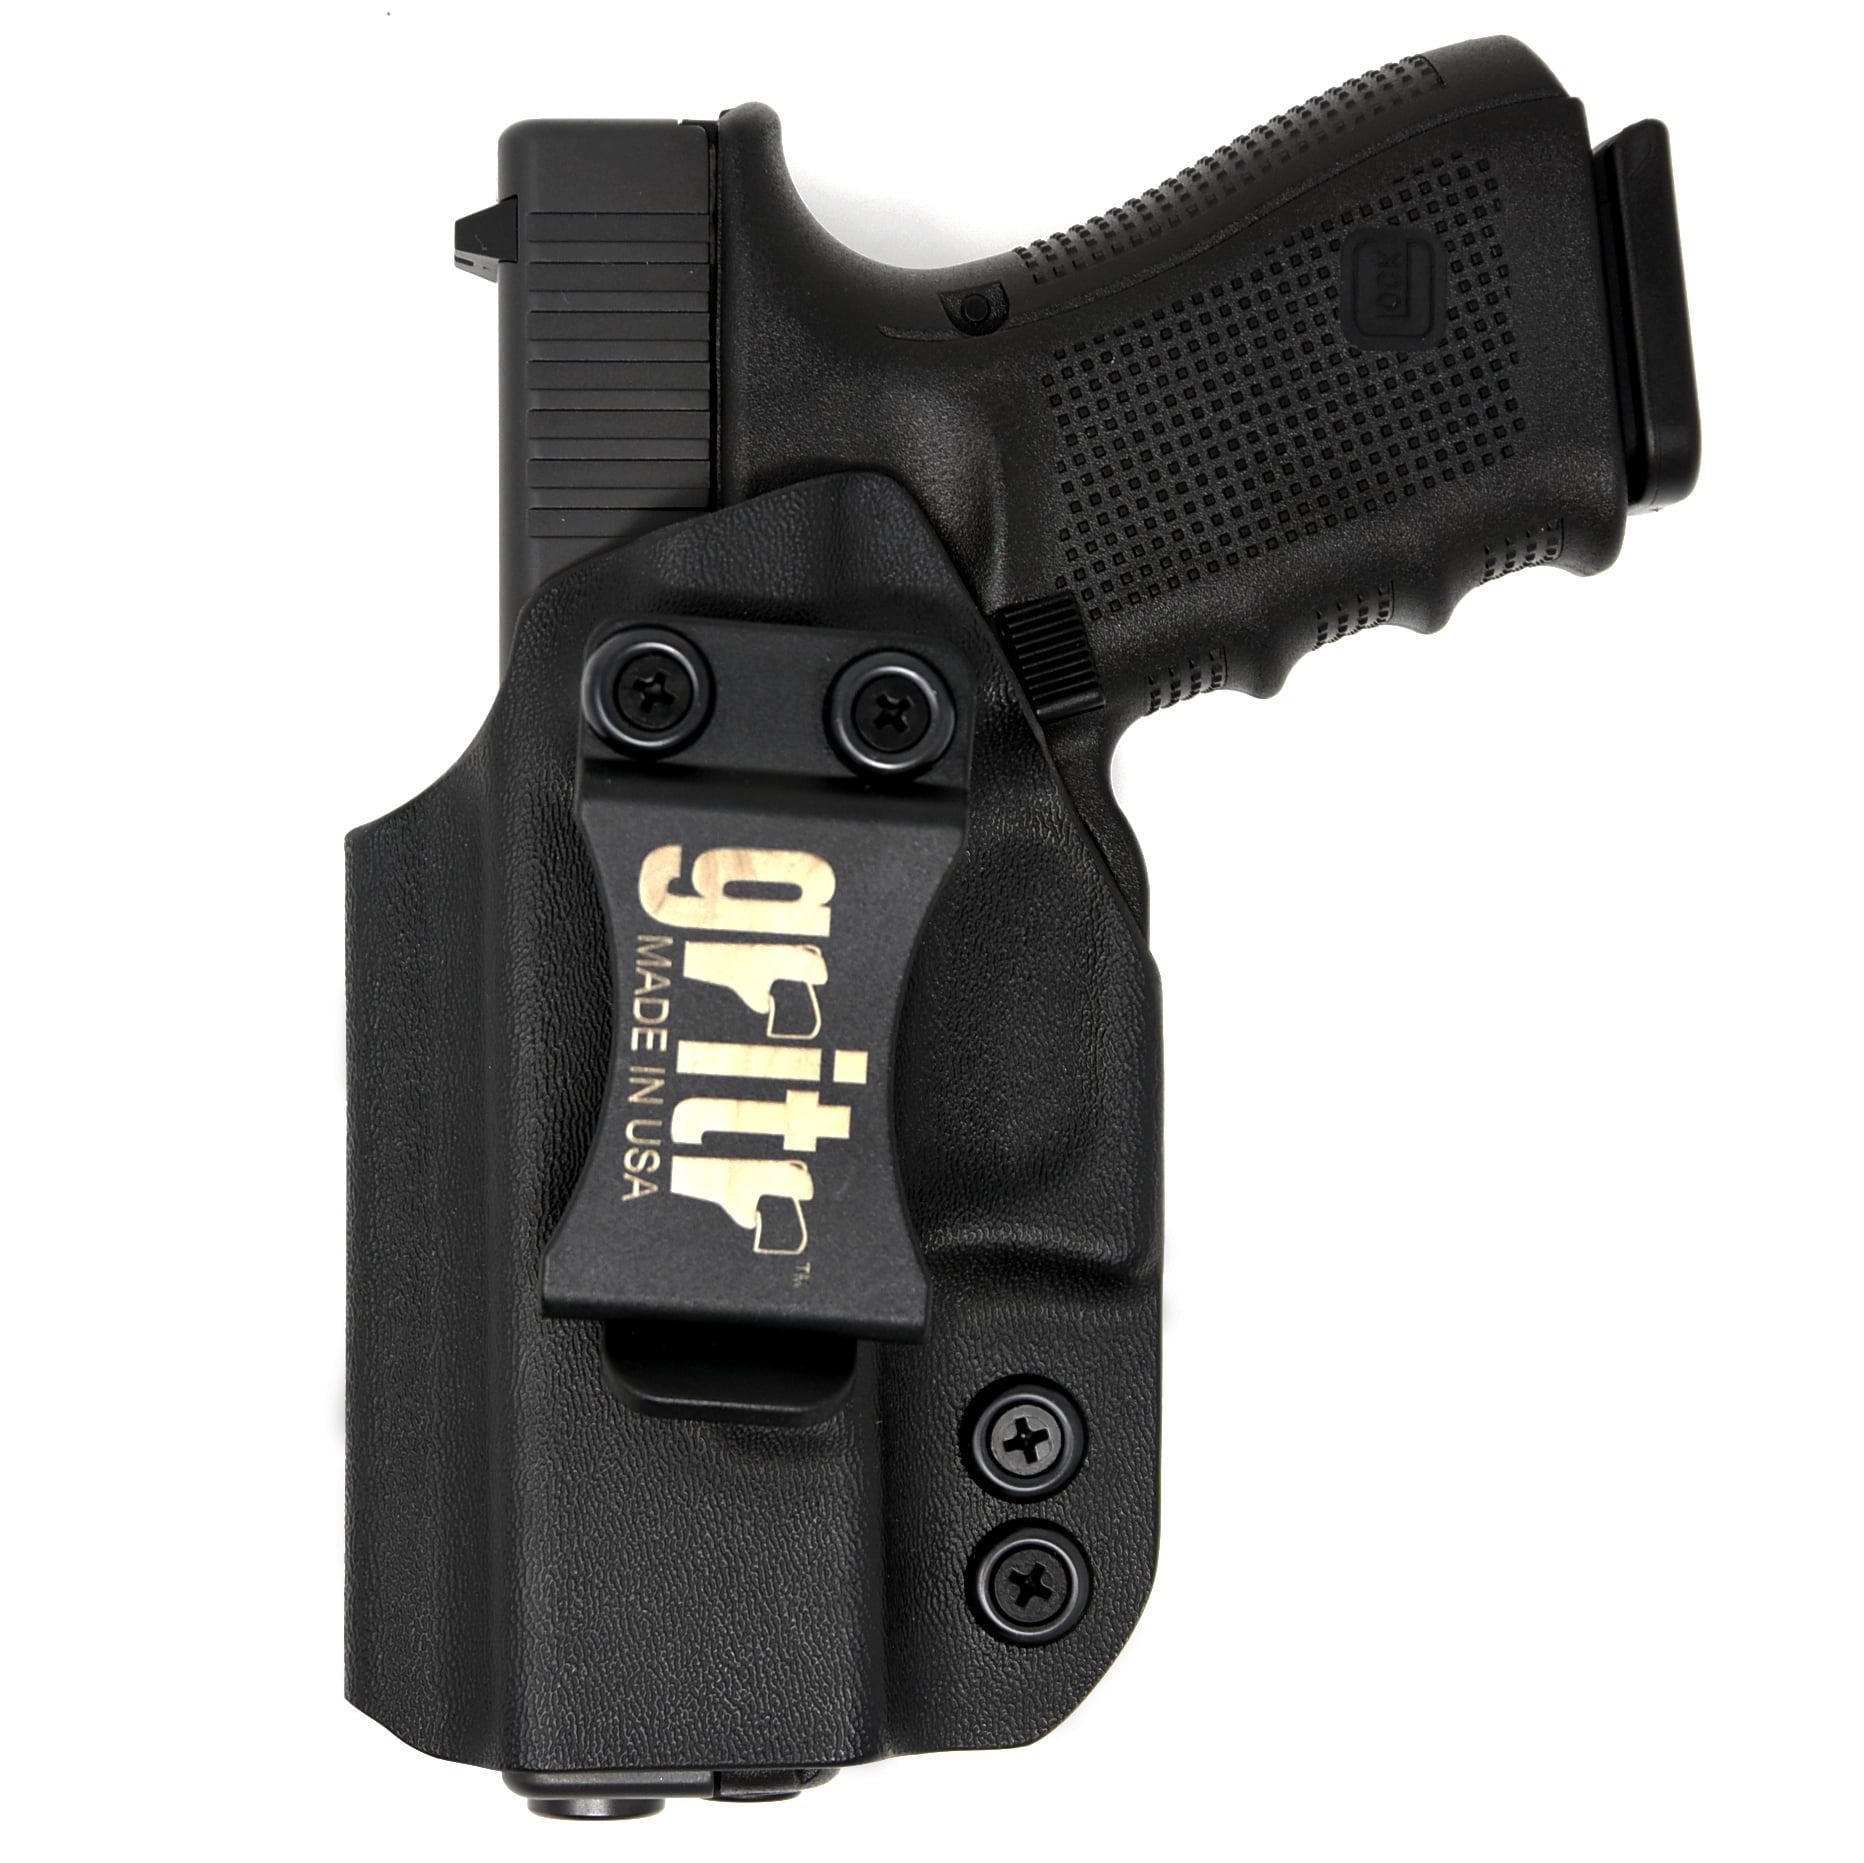 NUOVA RIVISTA Barsony DOPPIA CUSTODIA PER FN GLOCK HK Full Size 9mm 40 45 Pistols